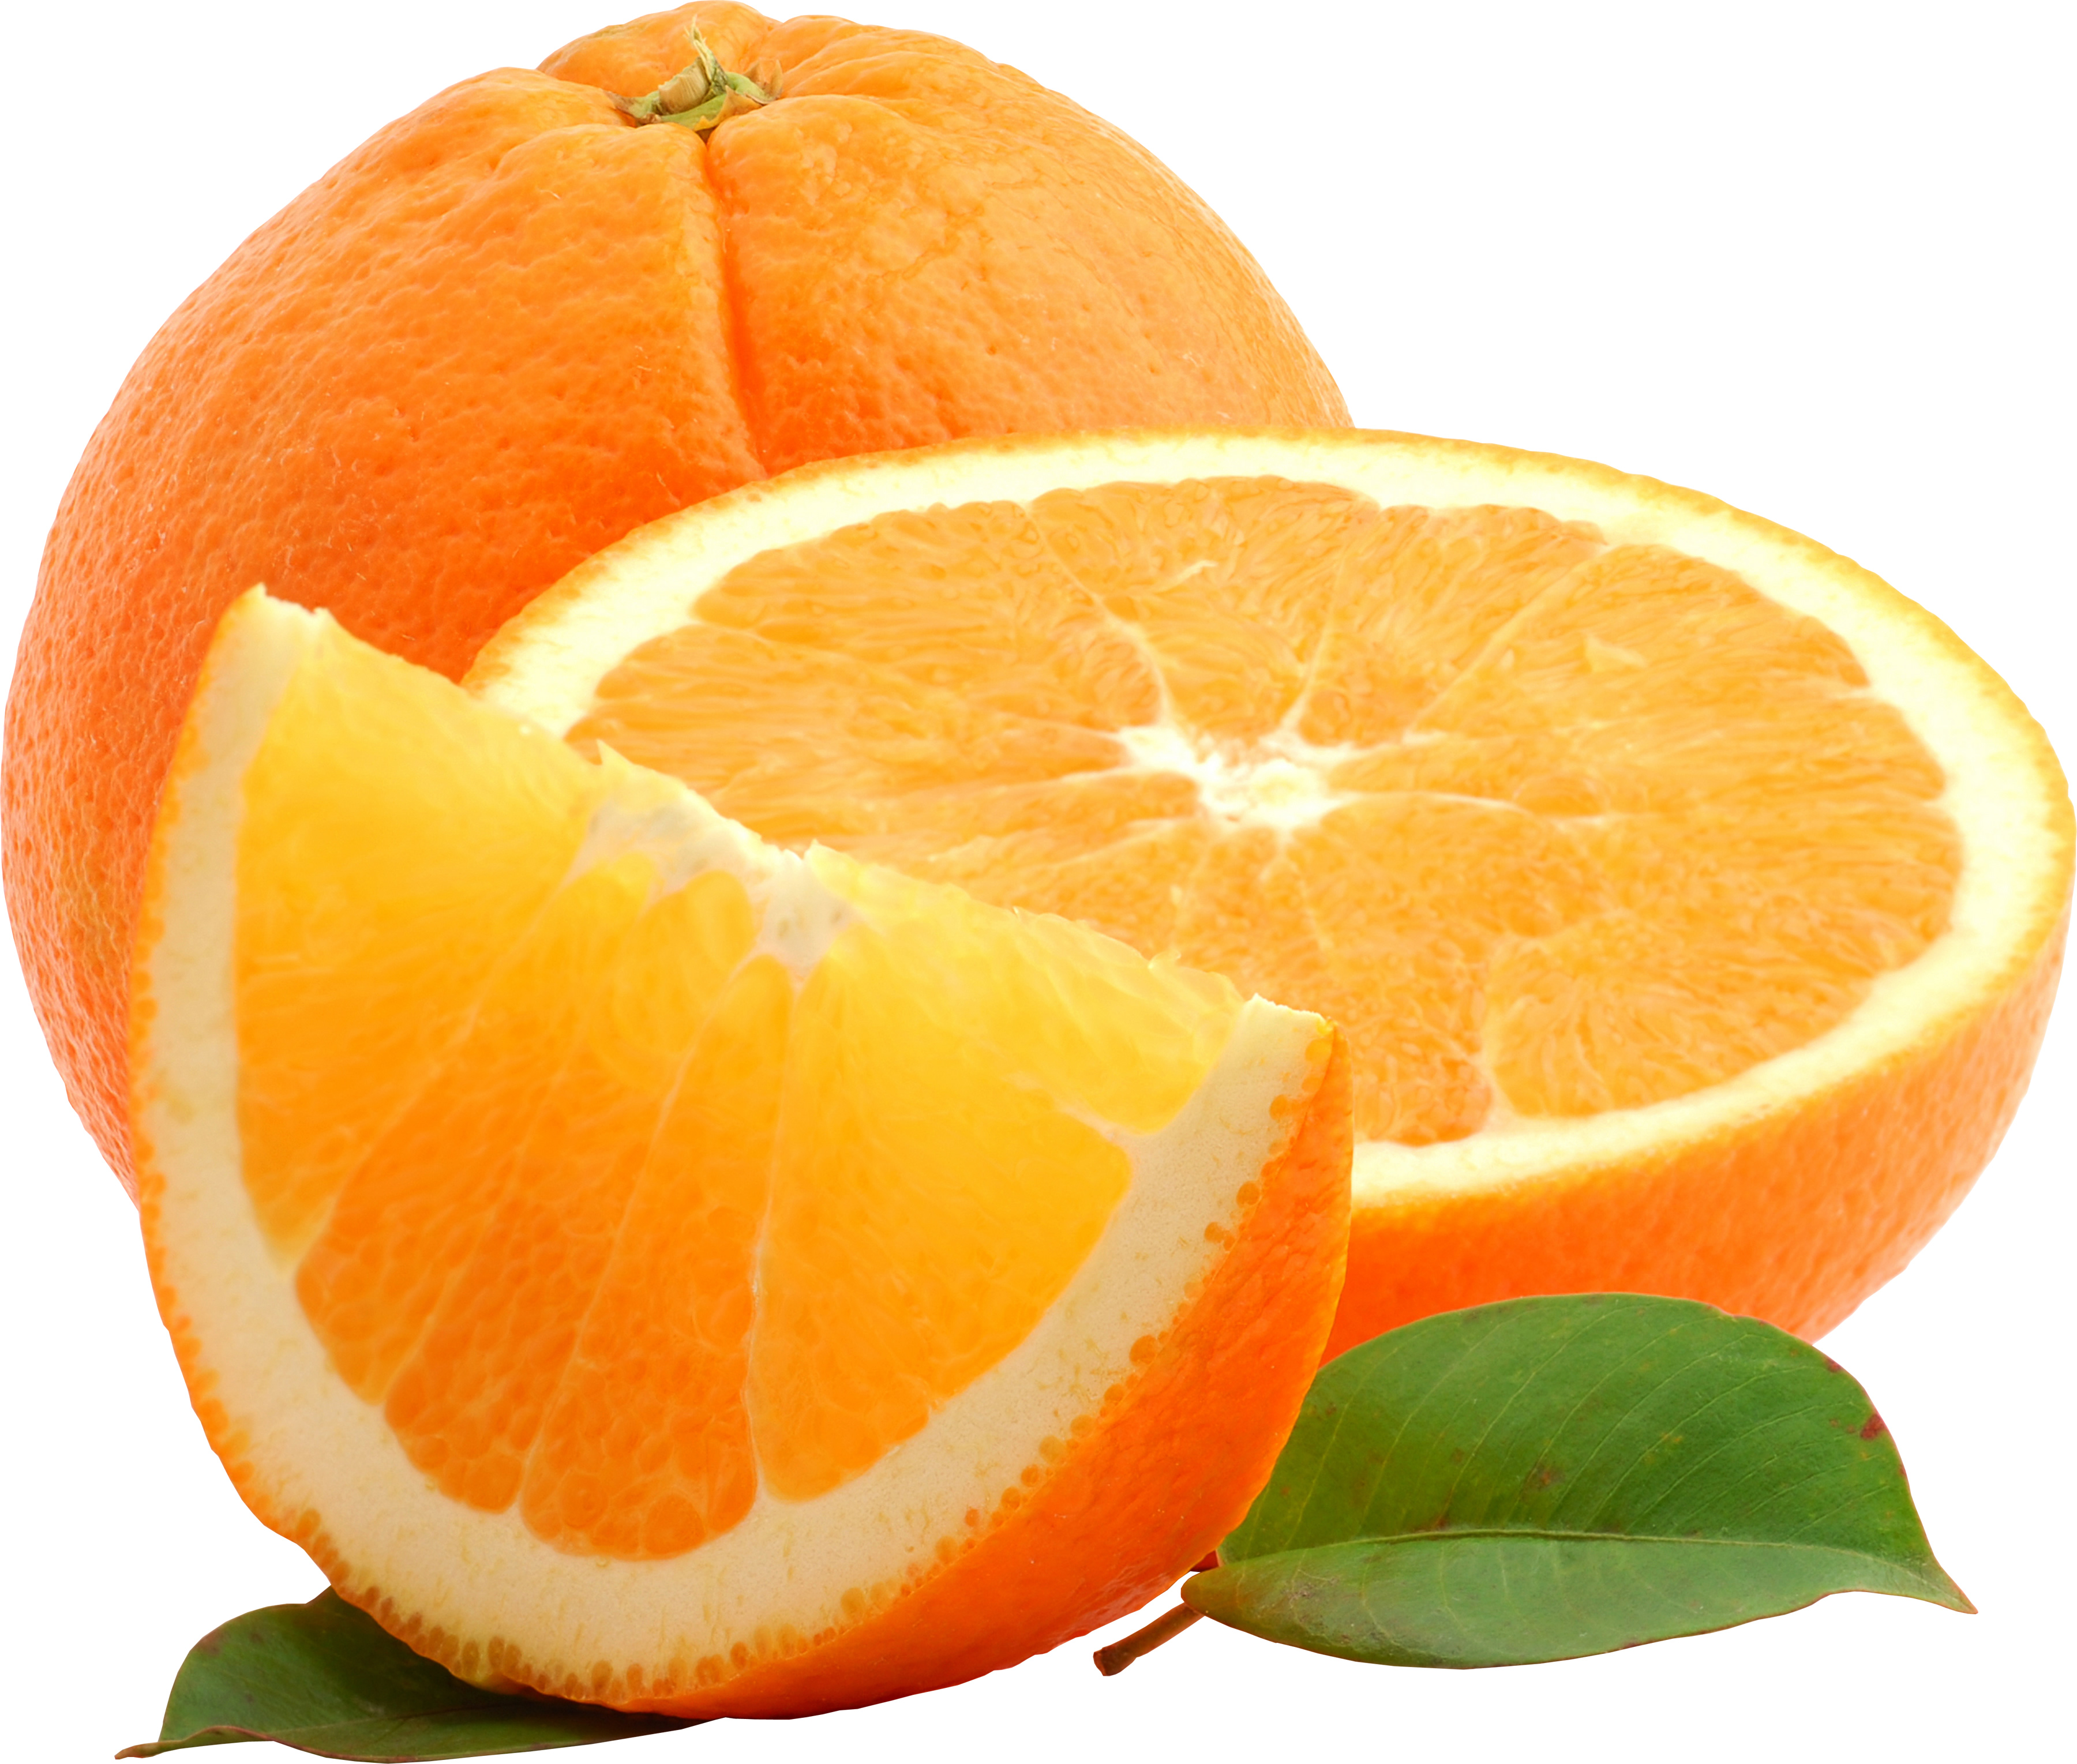 Orange clipart #7, Download drawings